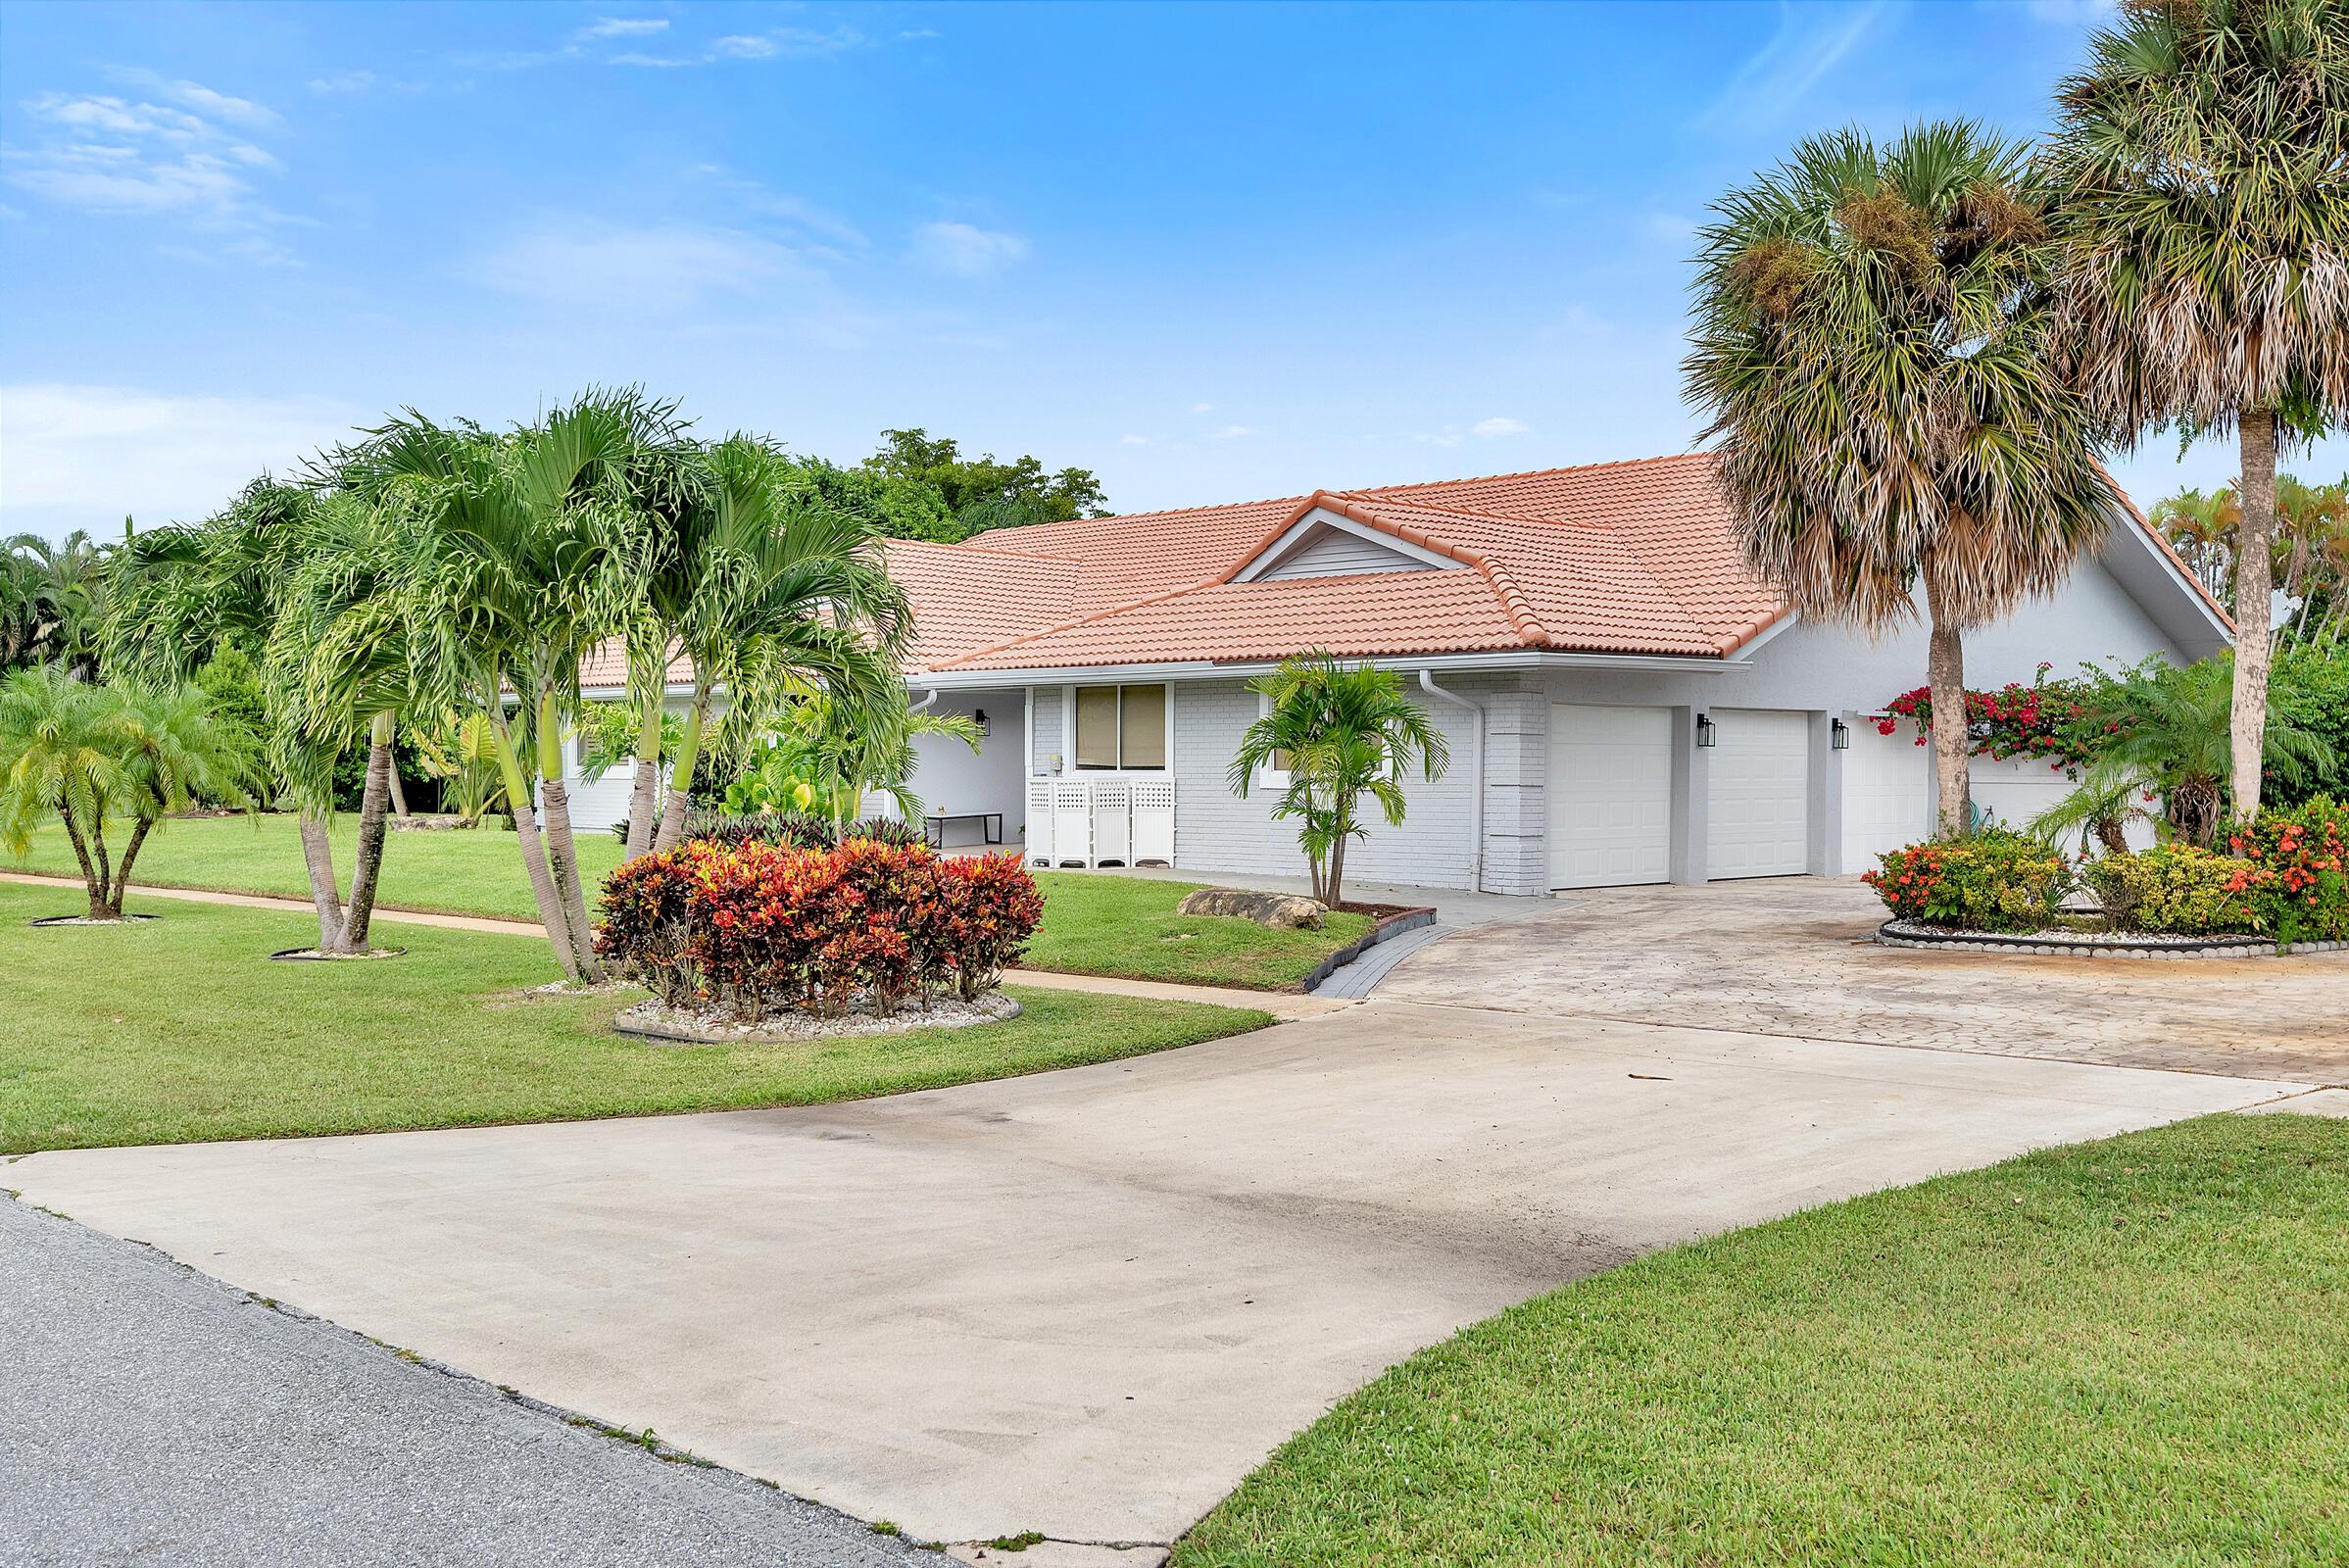 Photo of 11240 Wingfoot Drive, Boynton Beach, FL 33437